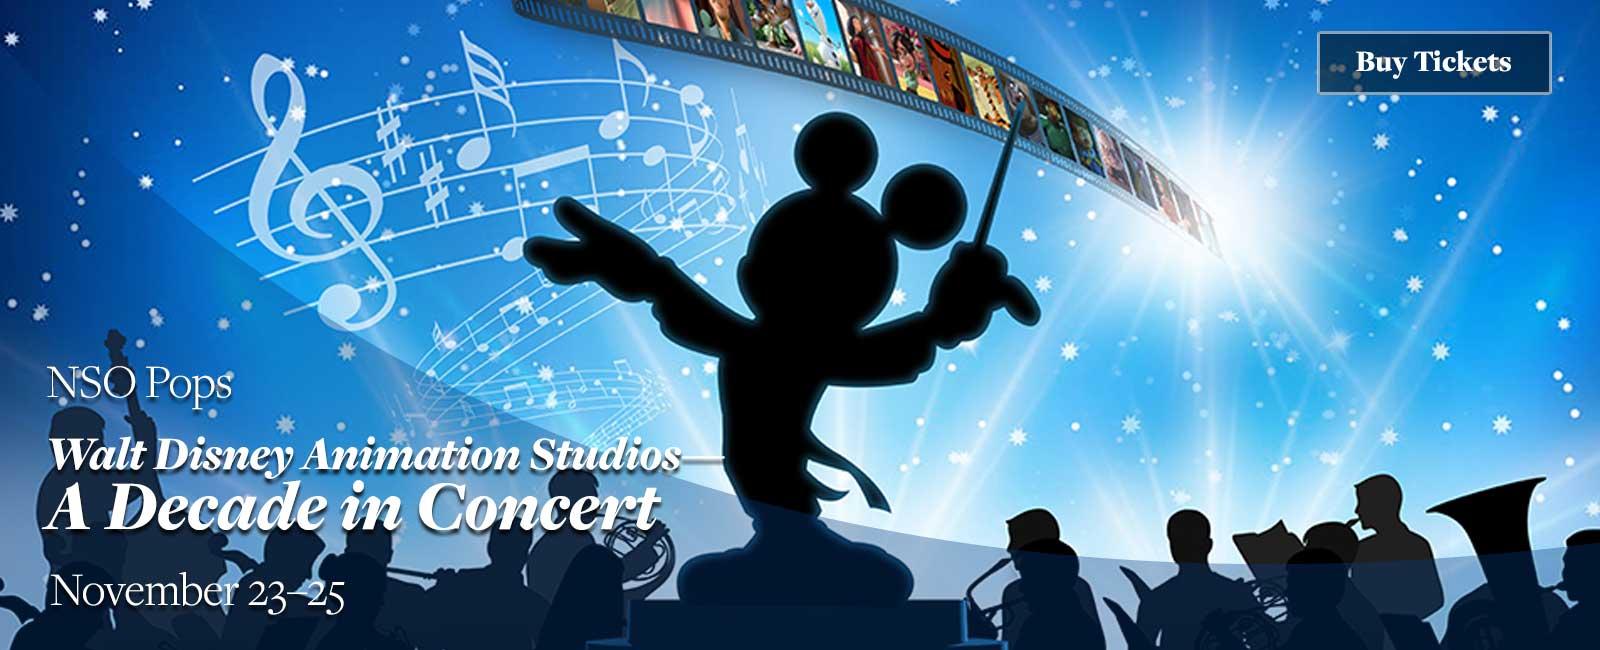 Walt Disney Animation Studios--A Decade in Concert